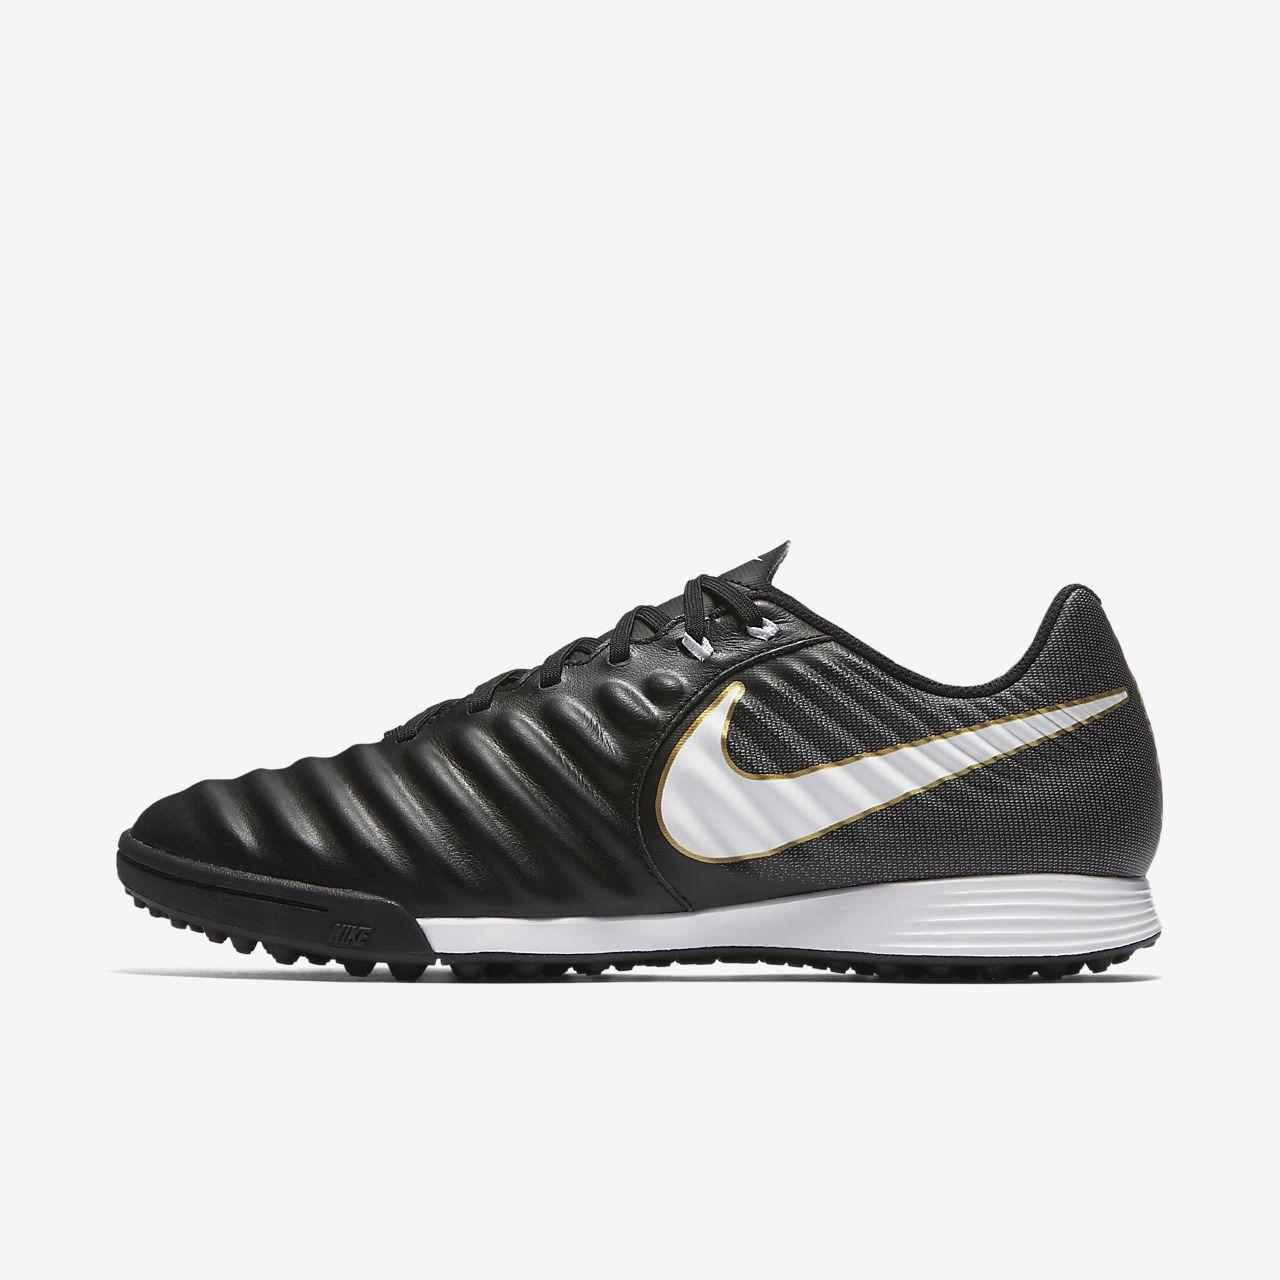 Nike Tiempox Ligera Iv TF, Chaussures de Football Homme, Noir (Black/White/Black 002), 39 EU